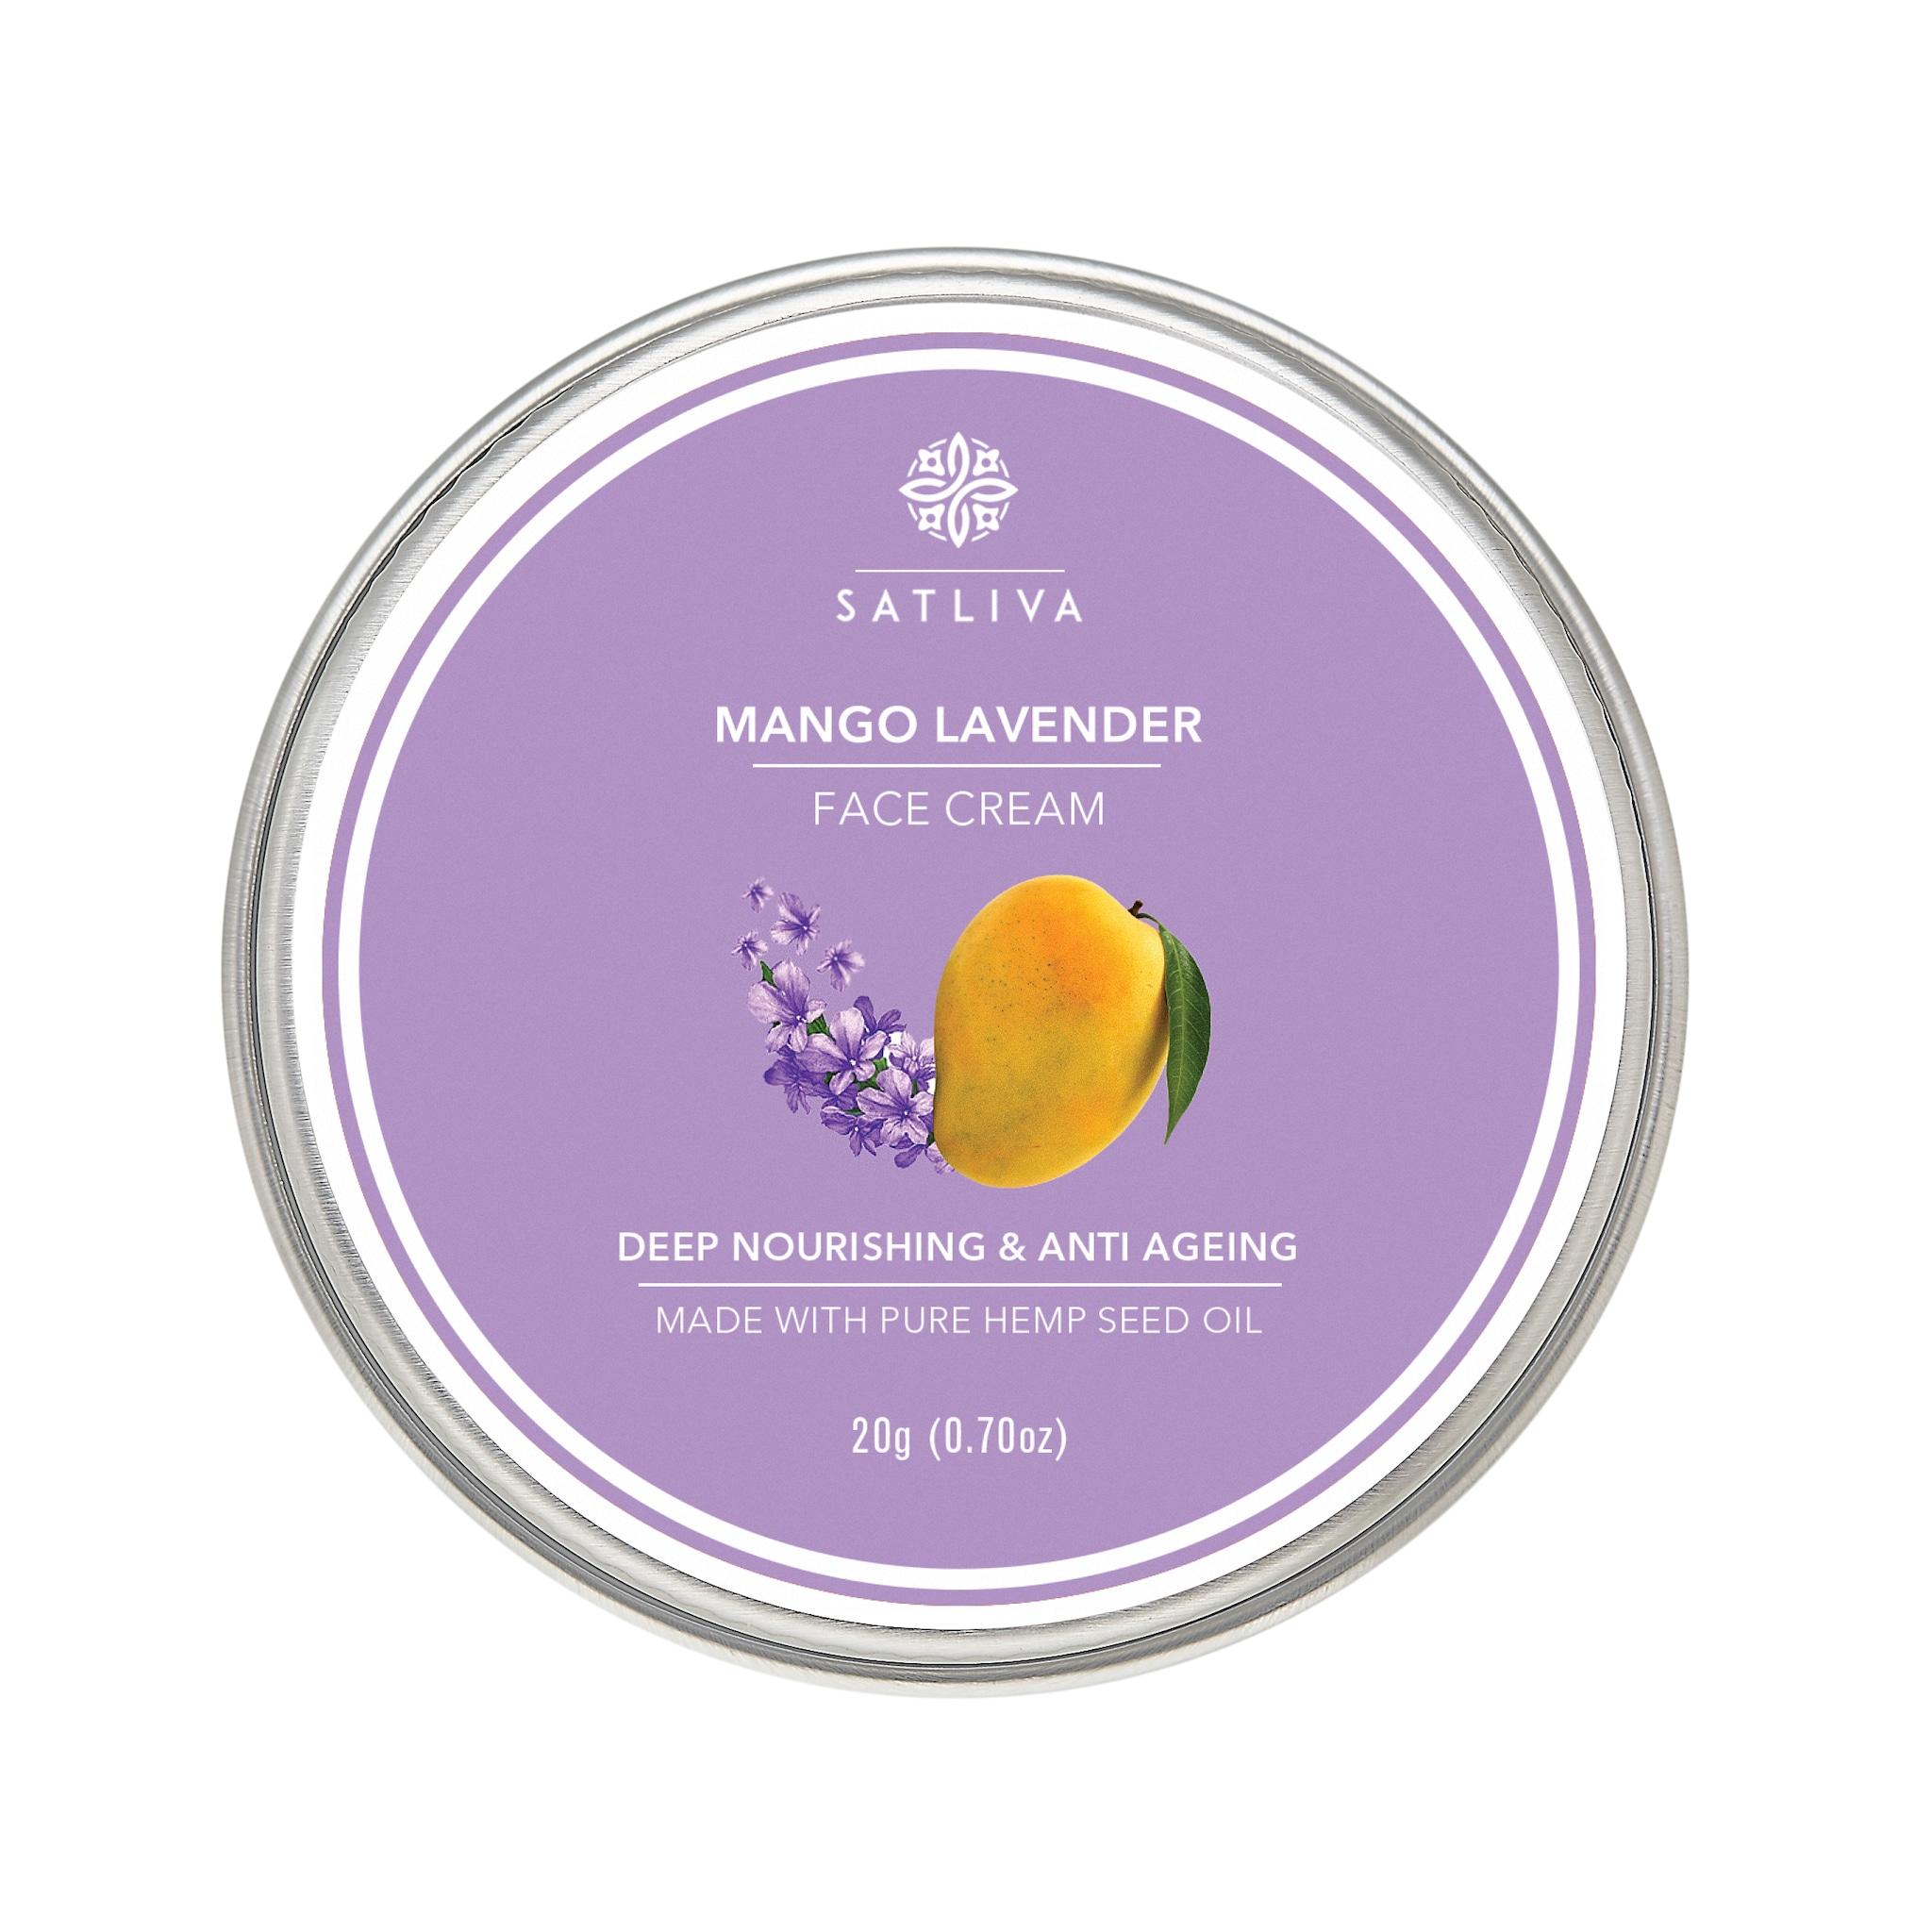 Satliva Mango Lavender Face Cream (20g)